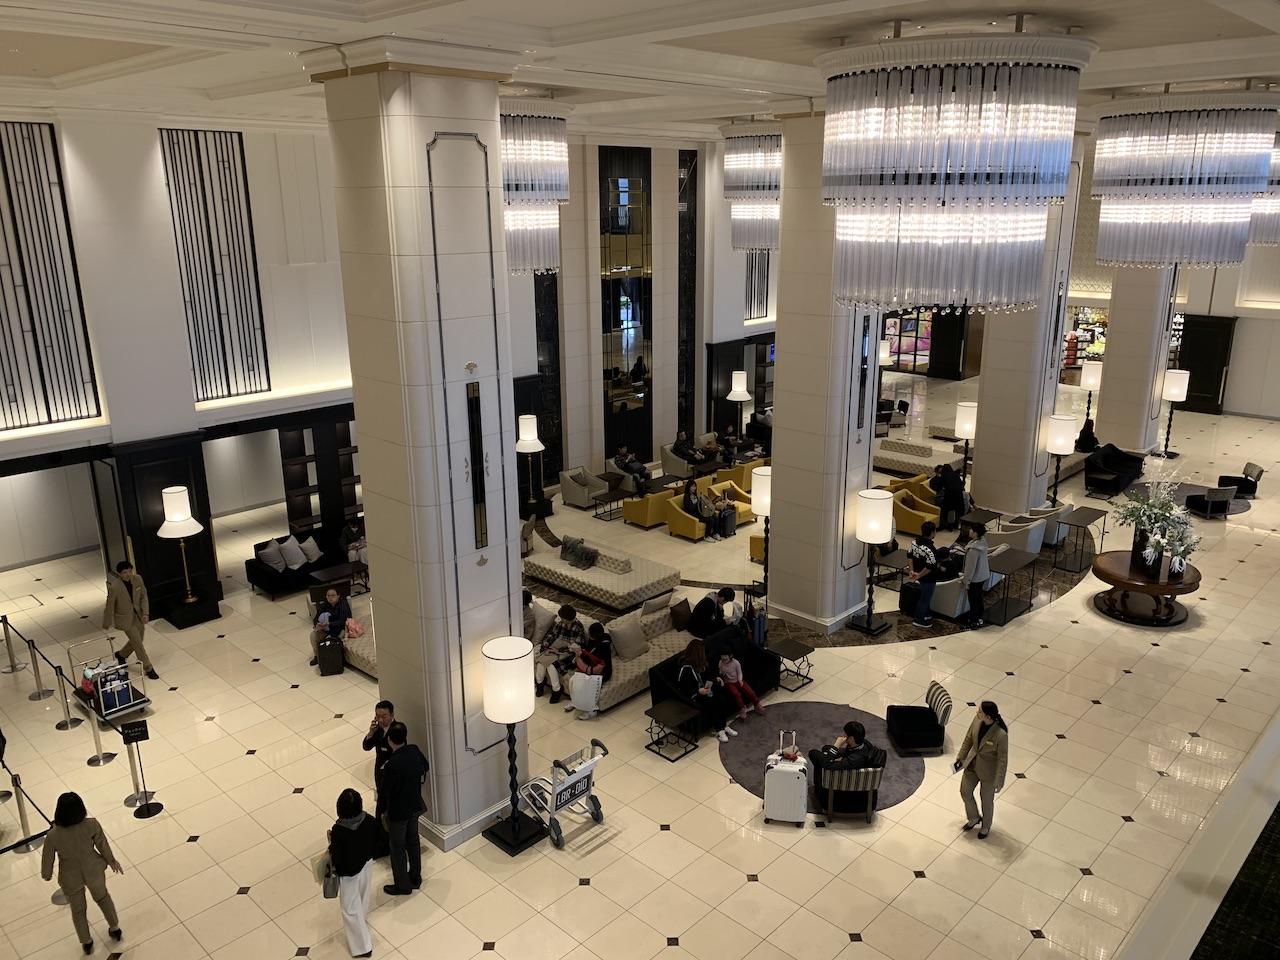 liber-hotel-usj-entrance-2